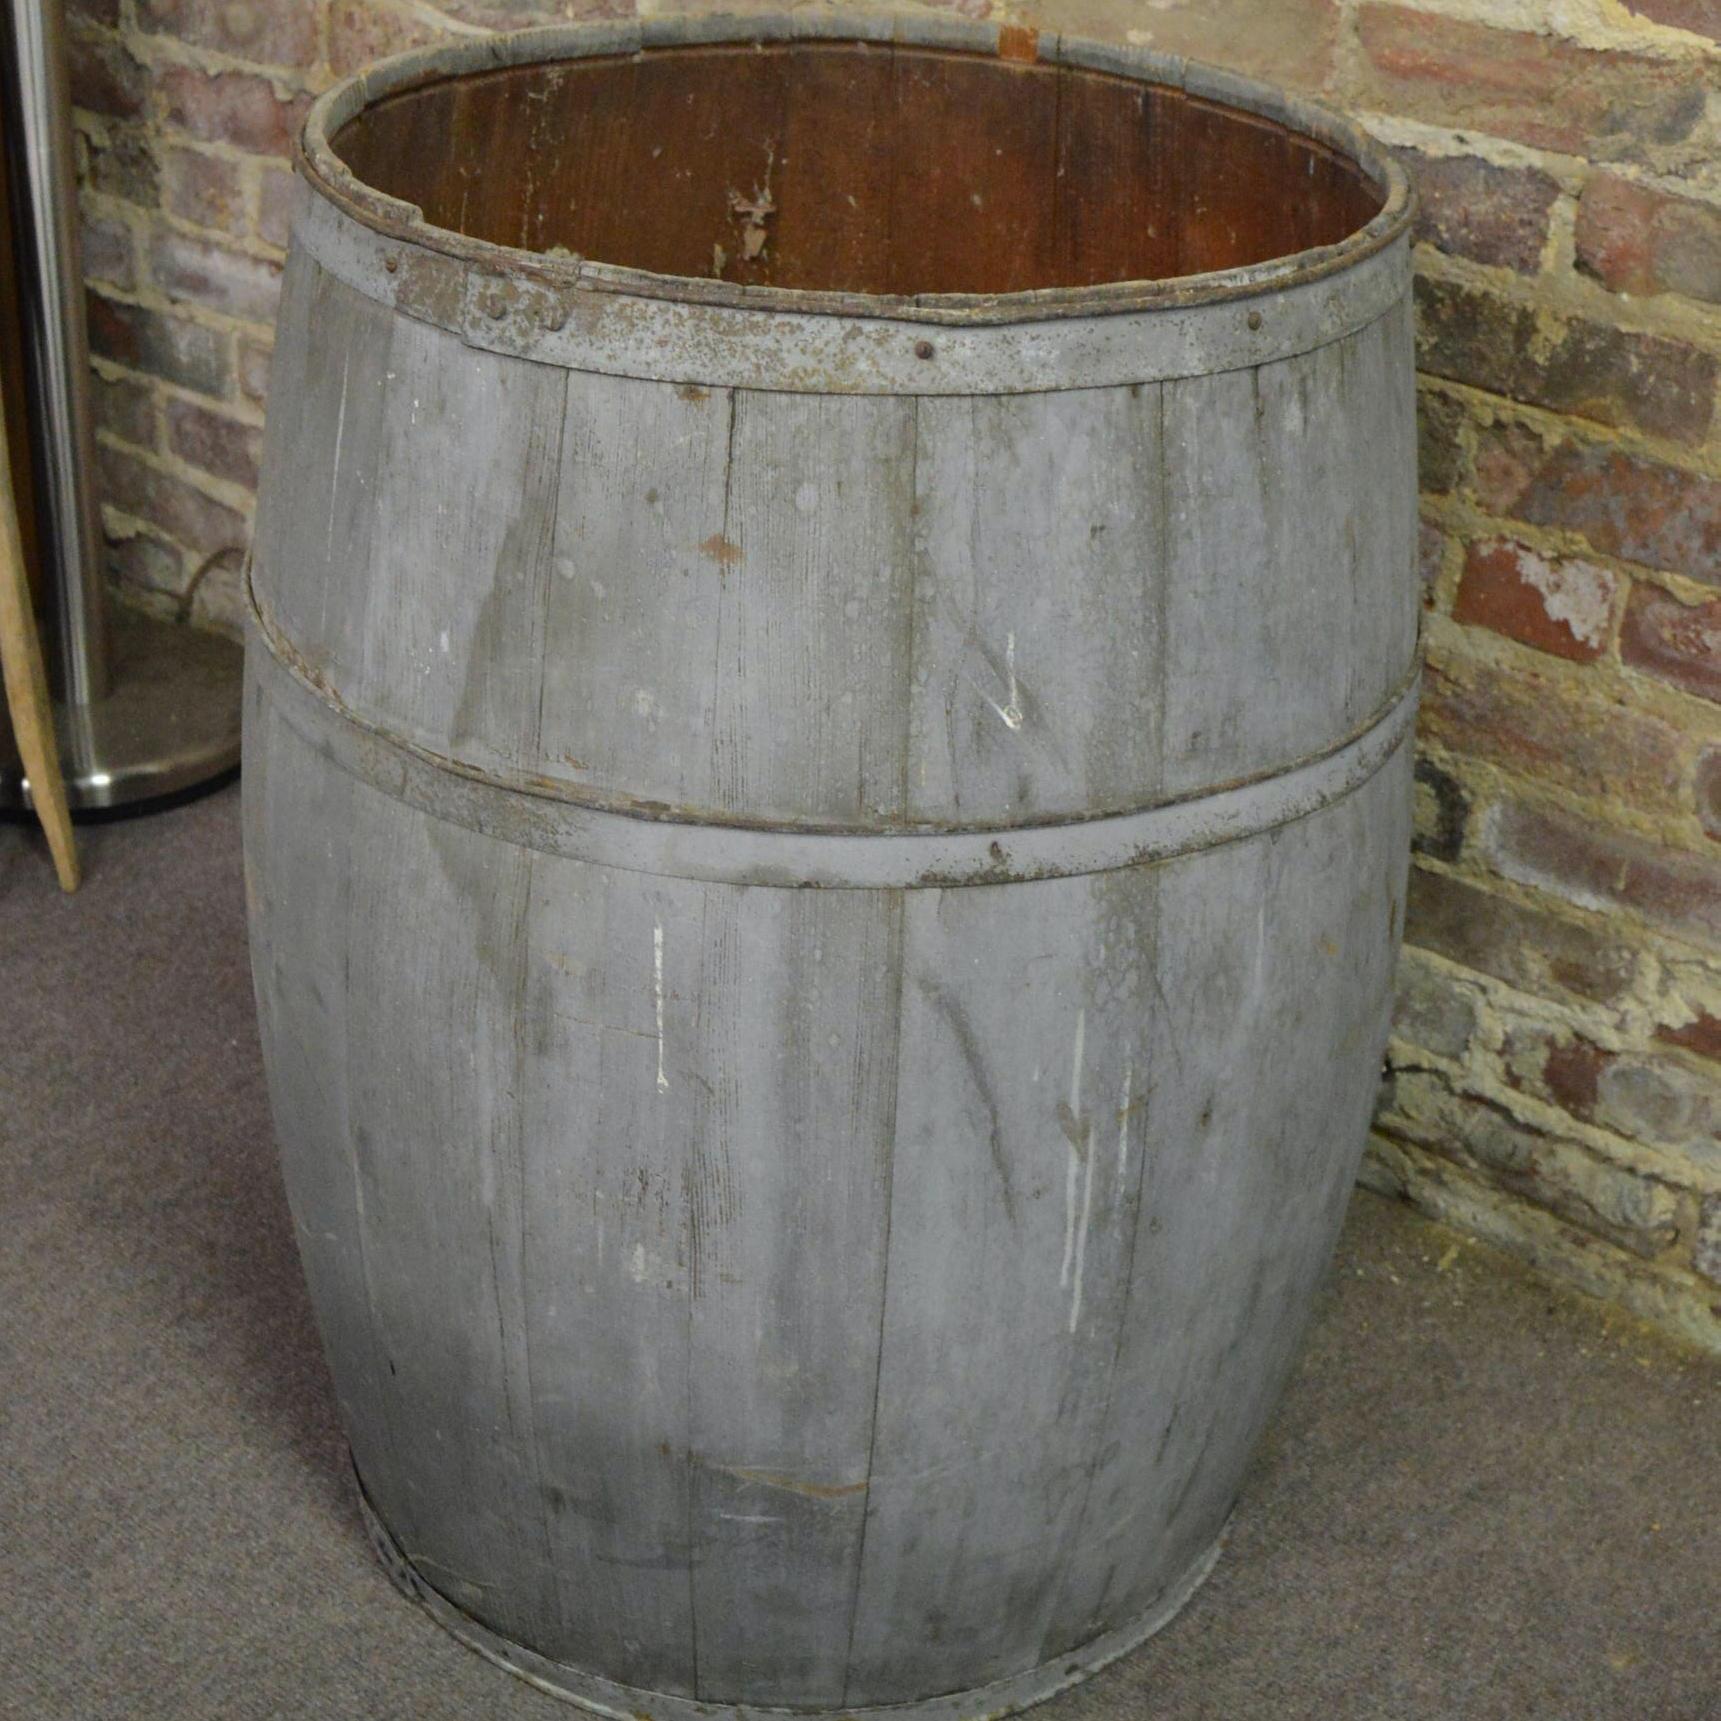 Painted Wooden Barrel